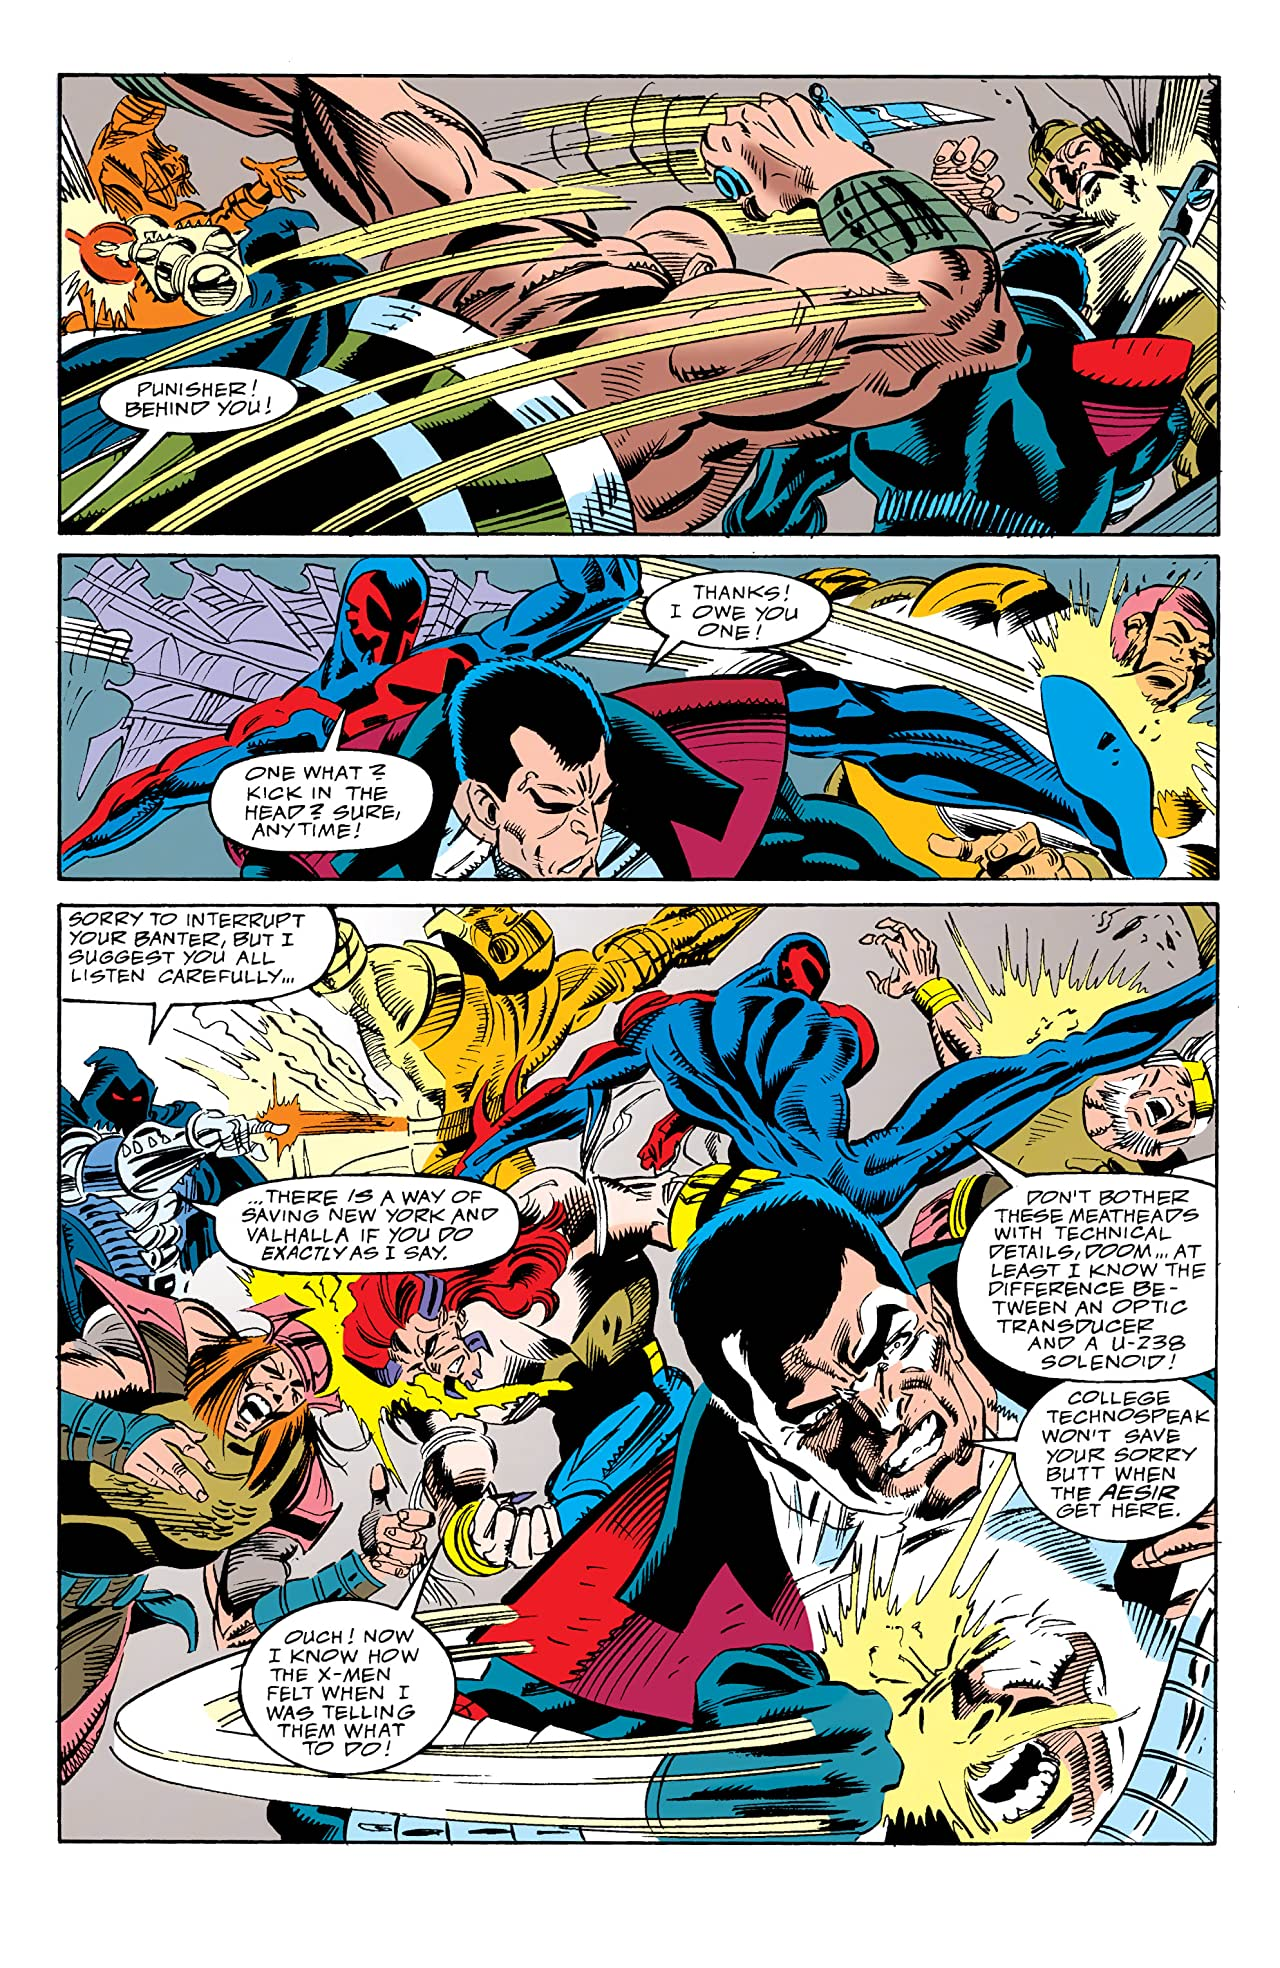 Punisher 2099 (1993-1995) #13